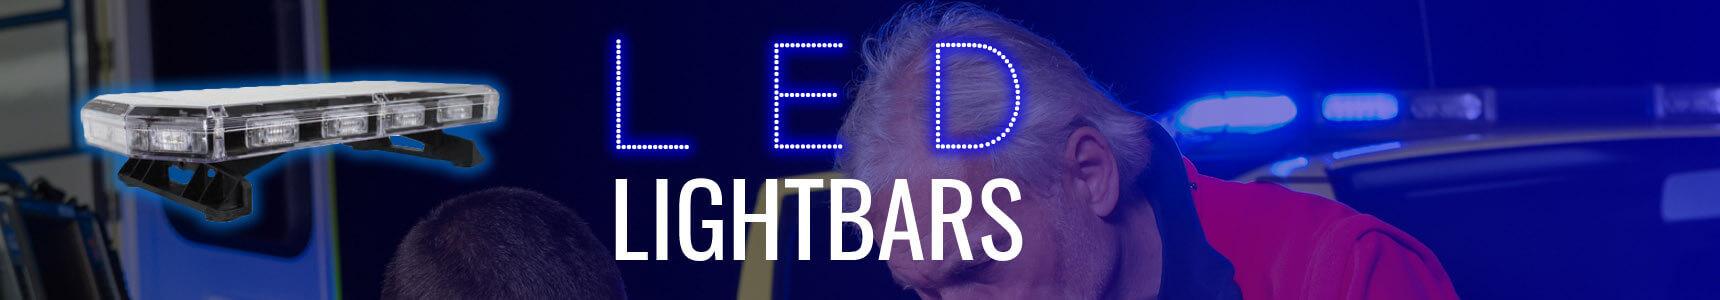 Guardian LED lightbars